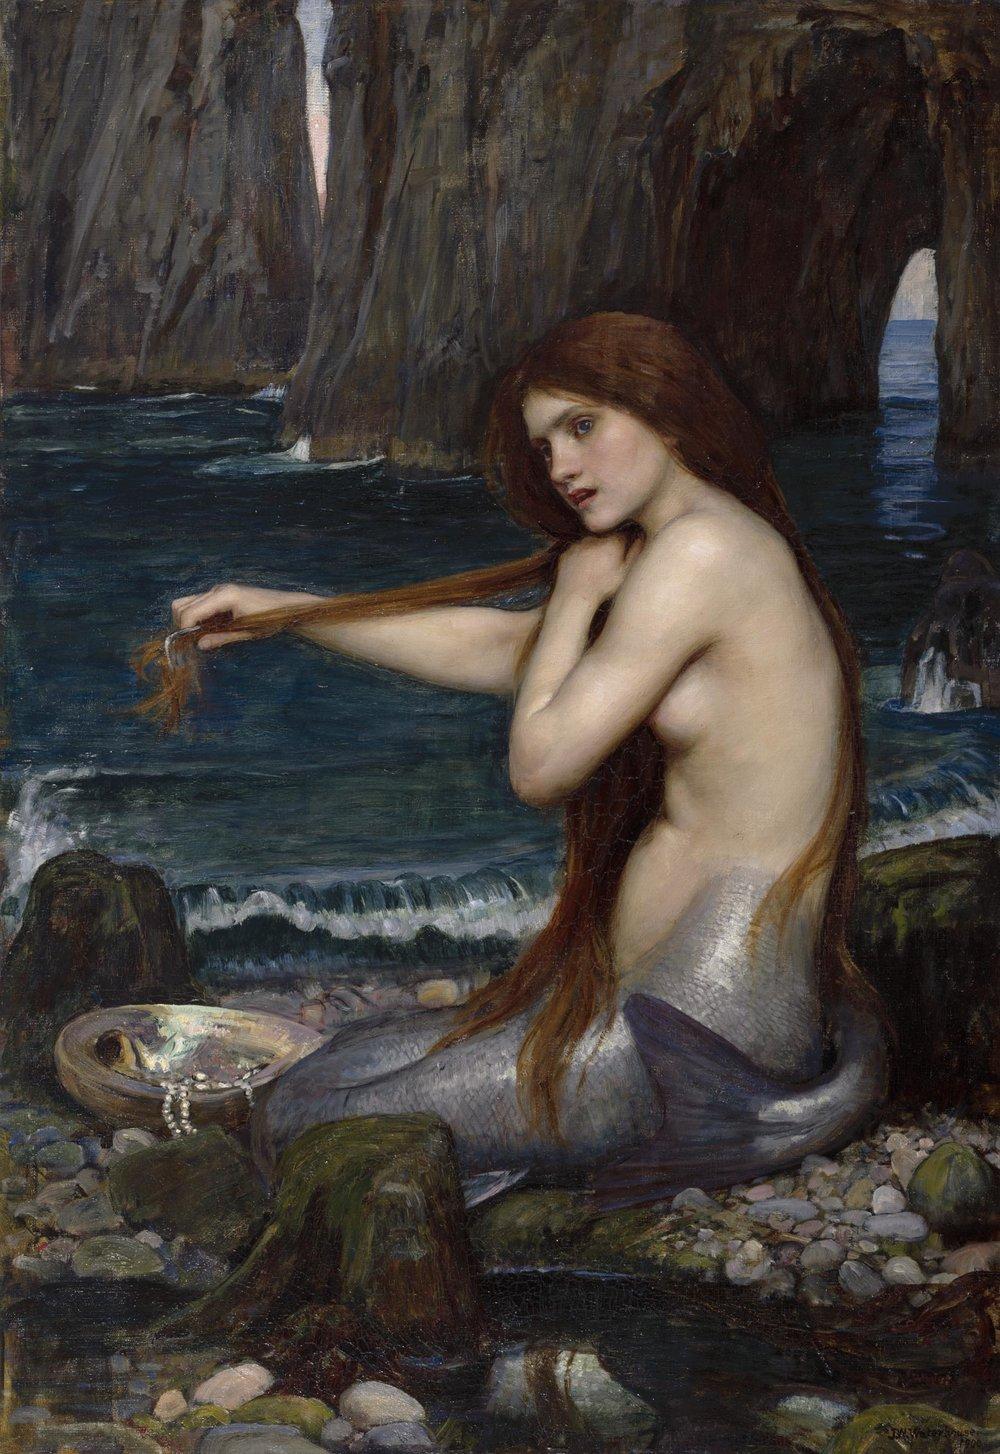 John William Waterhouse, 'Mermaid'